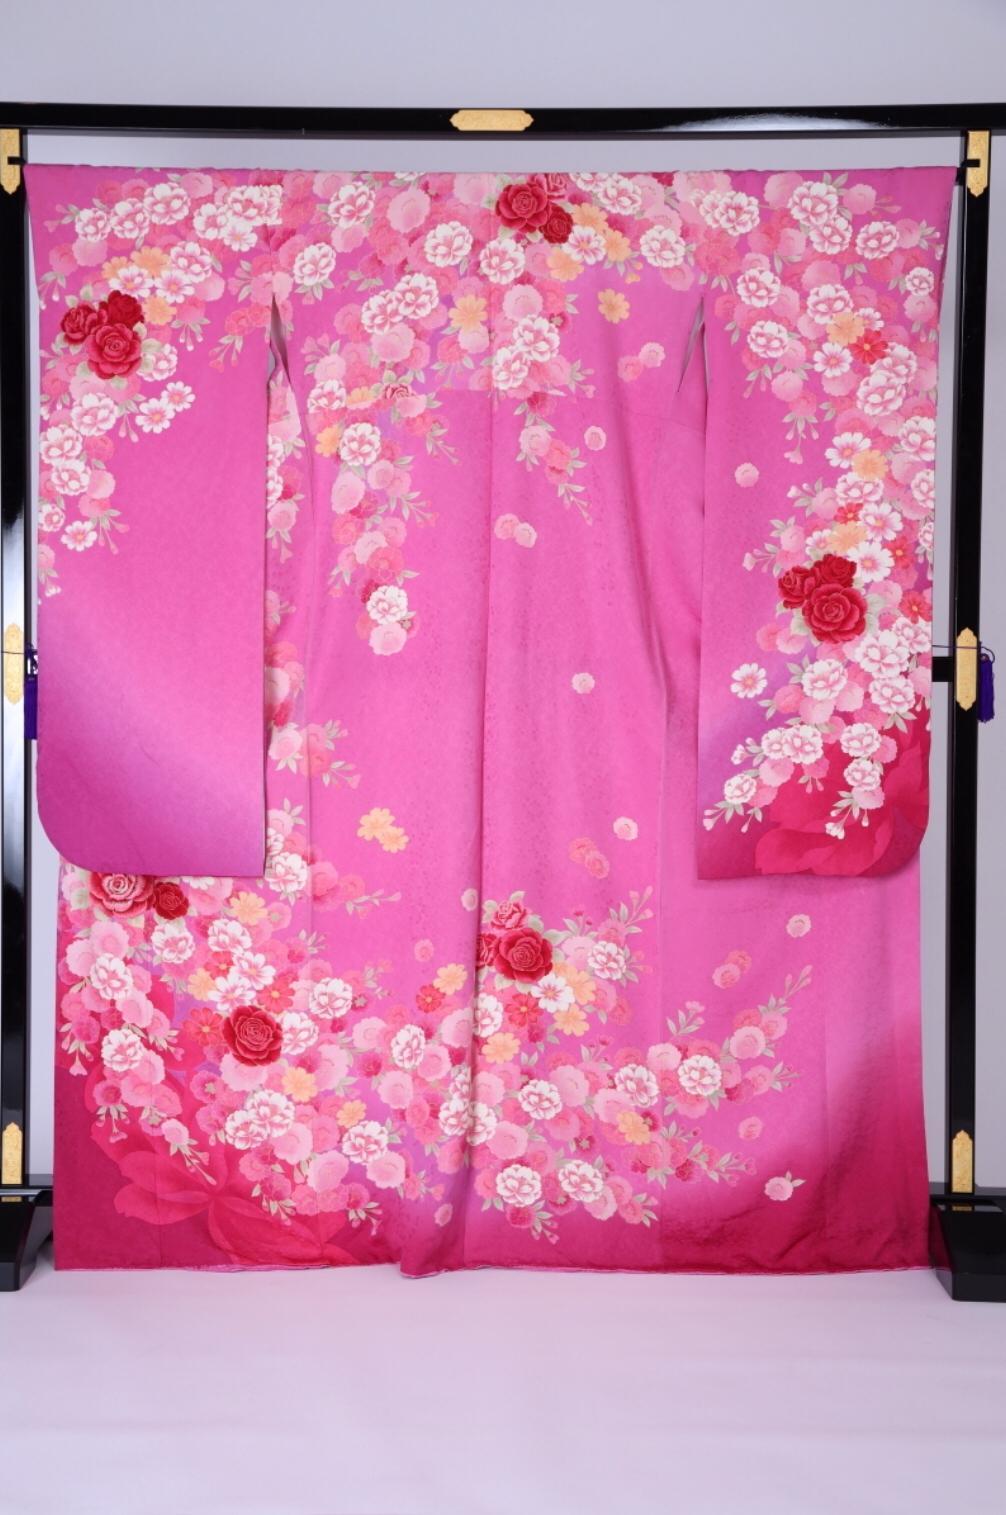 CLASS A 淺桃紅玫瑰花八重櫻正絹振袖